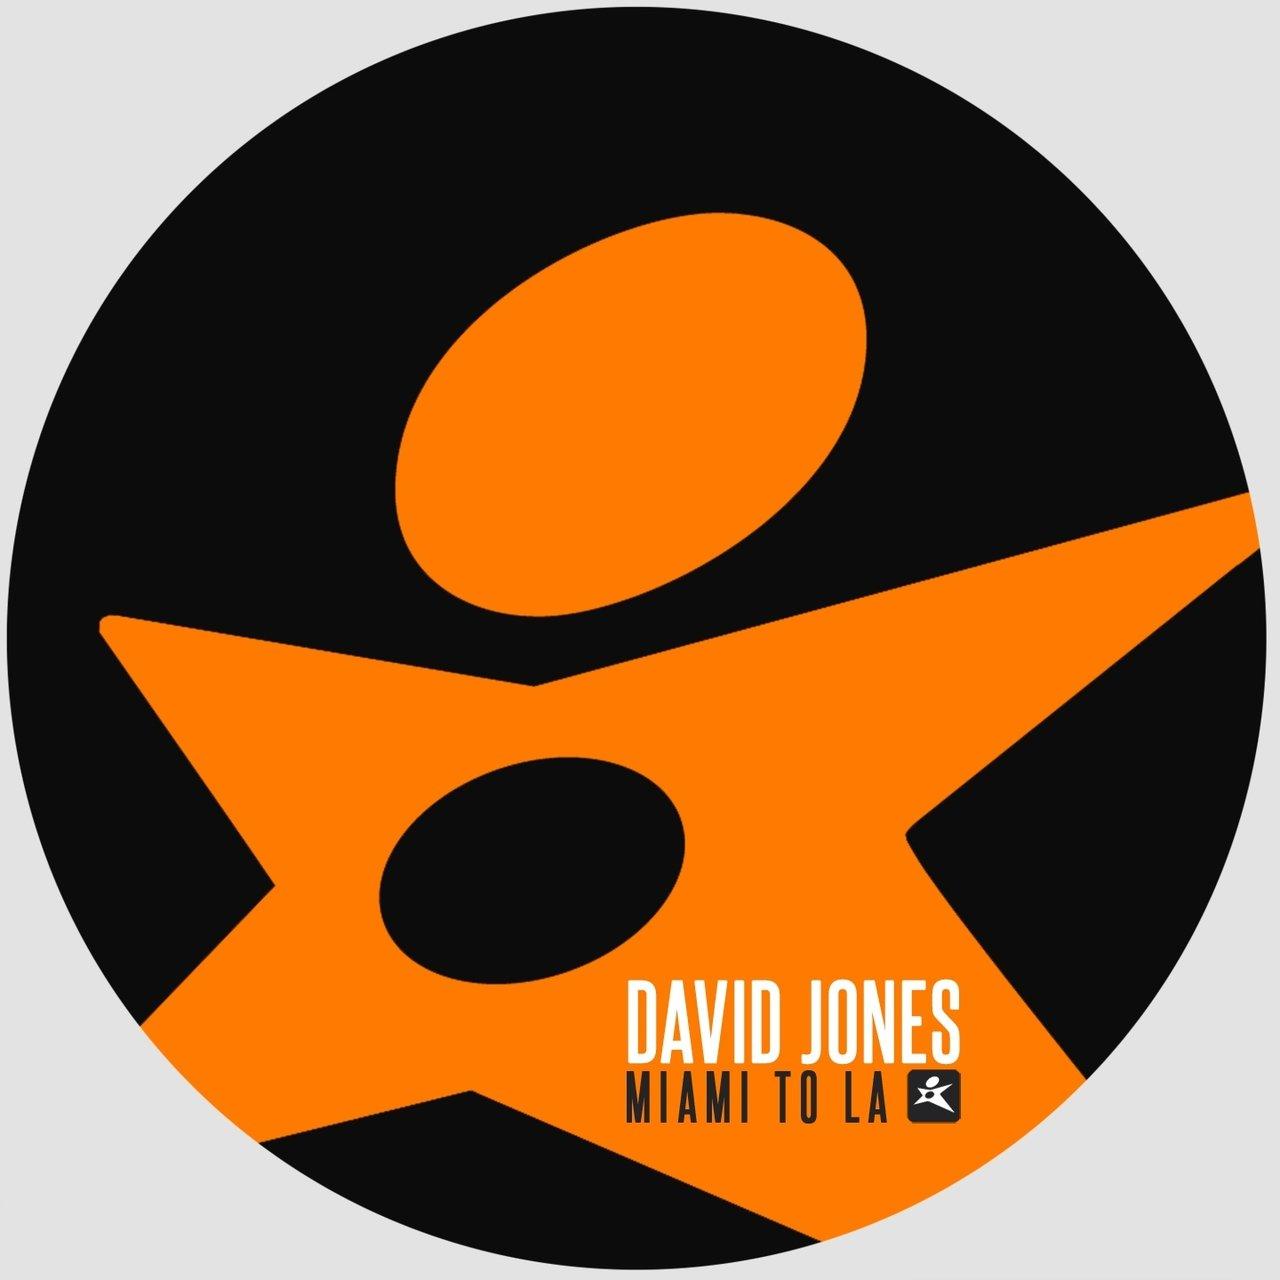 Tidal listen to david jones on tidal david jones miami to la buycottarizona Image collections